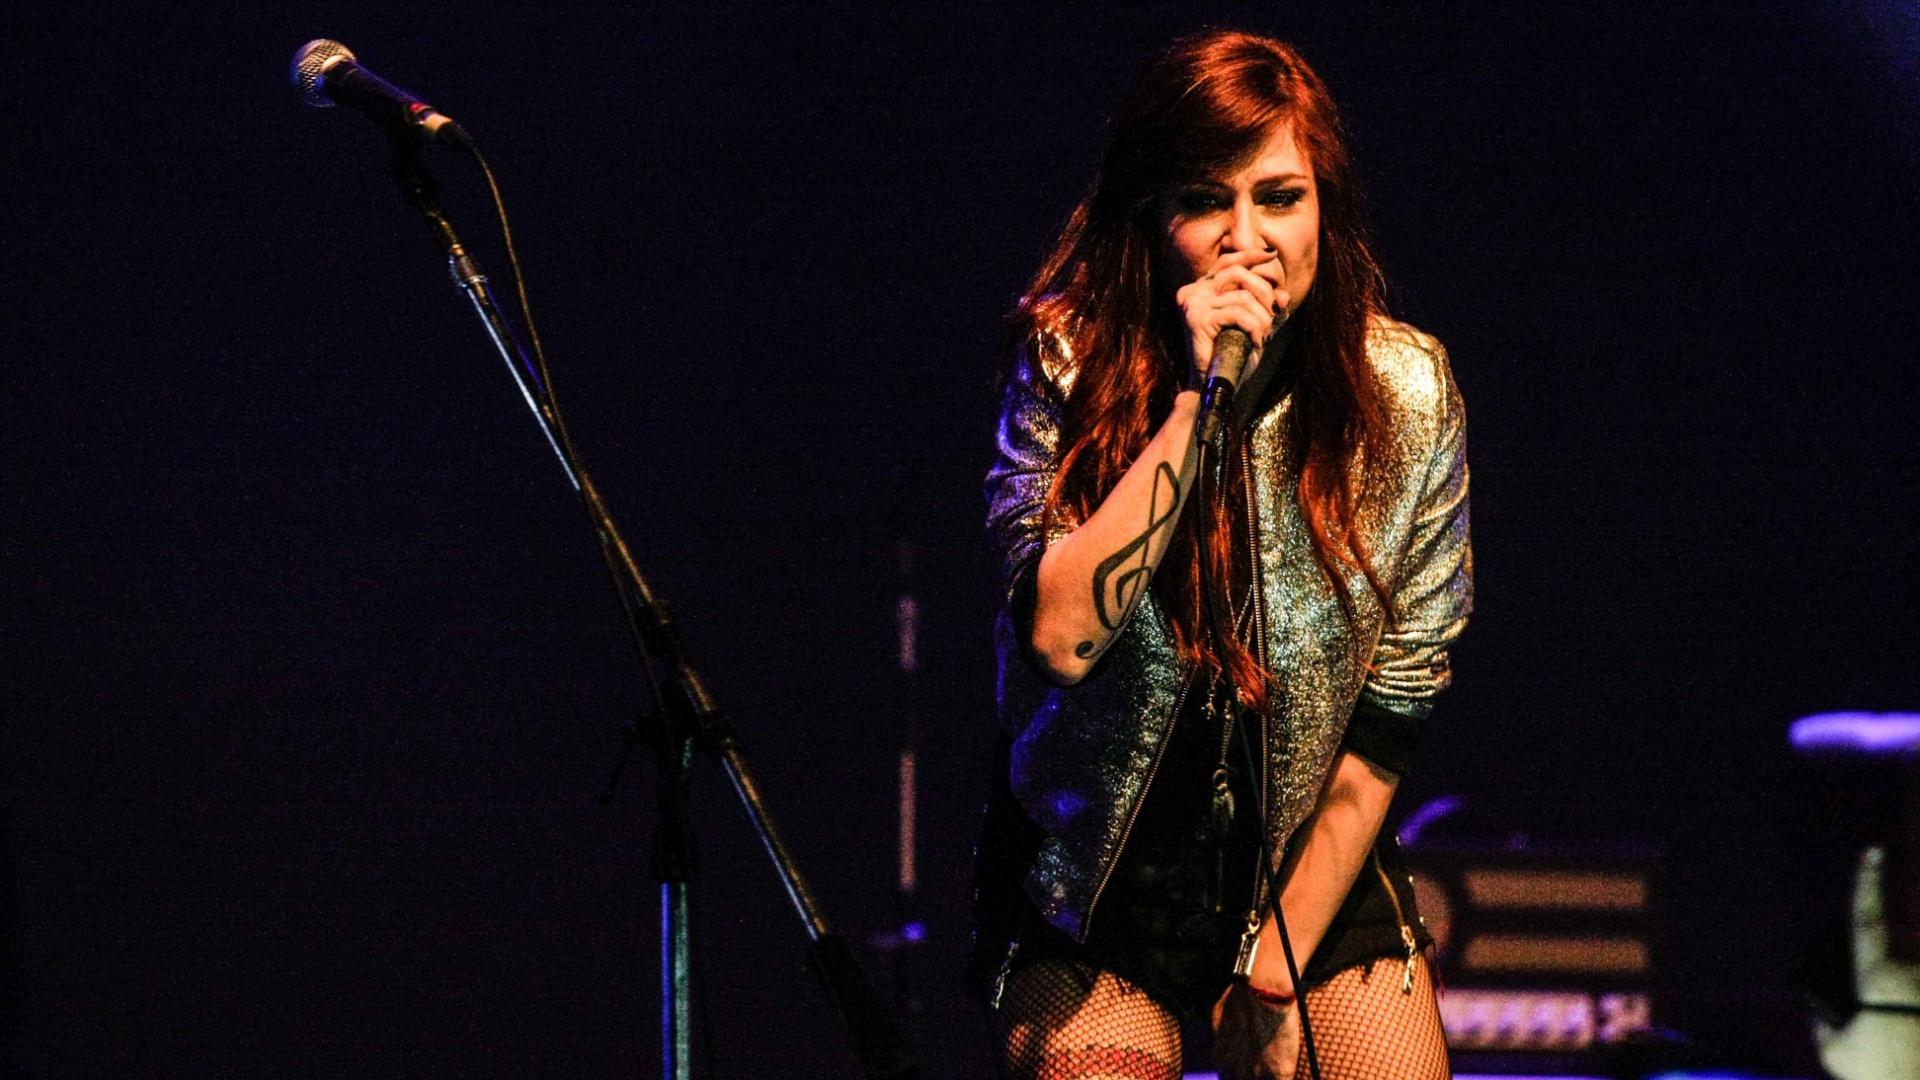 9.ago.2014 - A cantora baiana Pitty apresenta o seu mais novo álbum